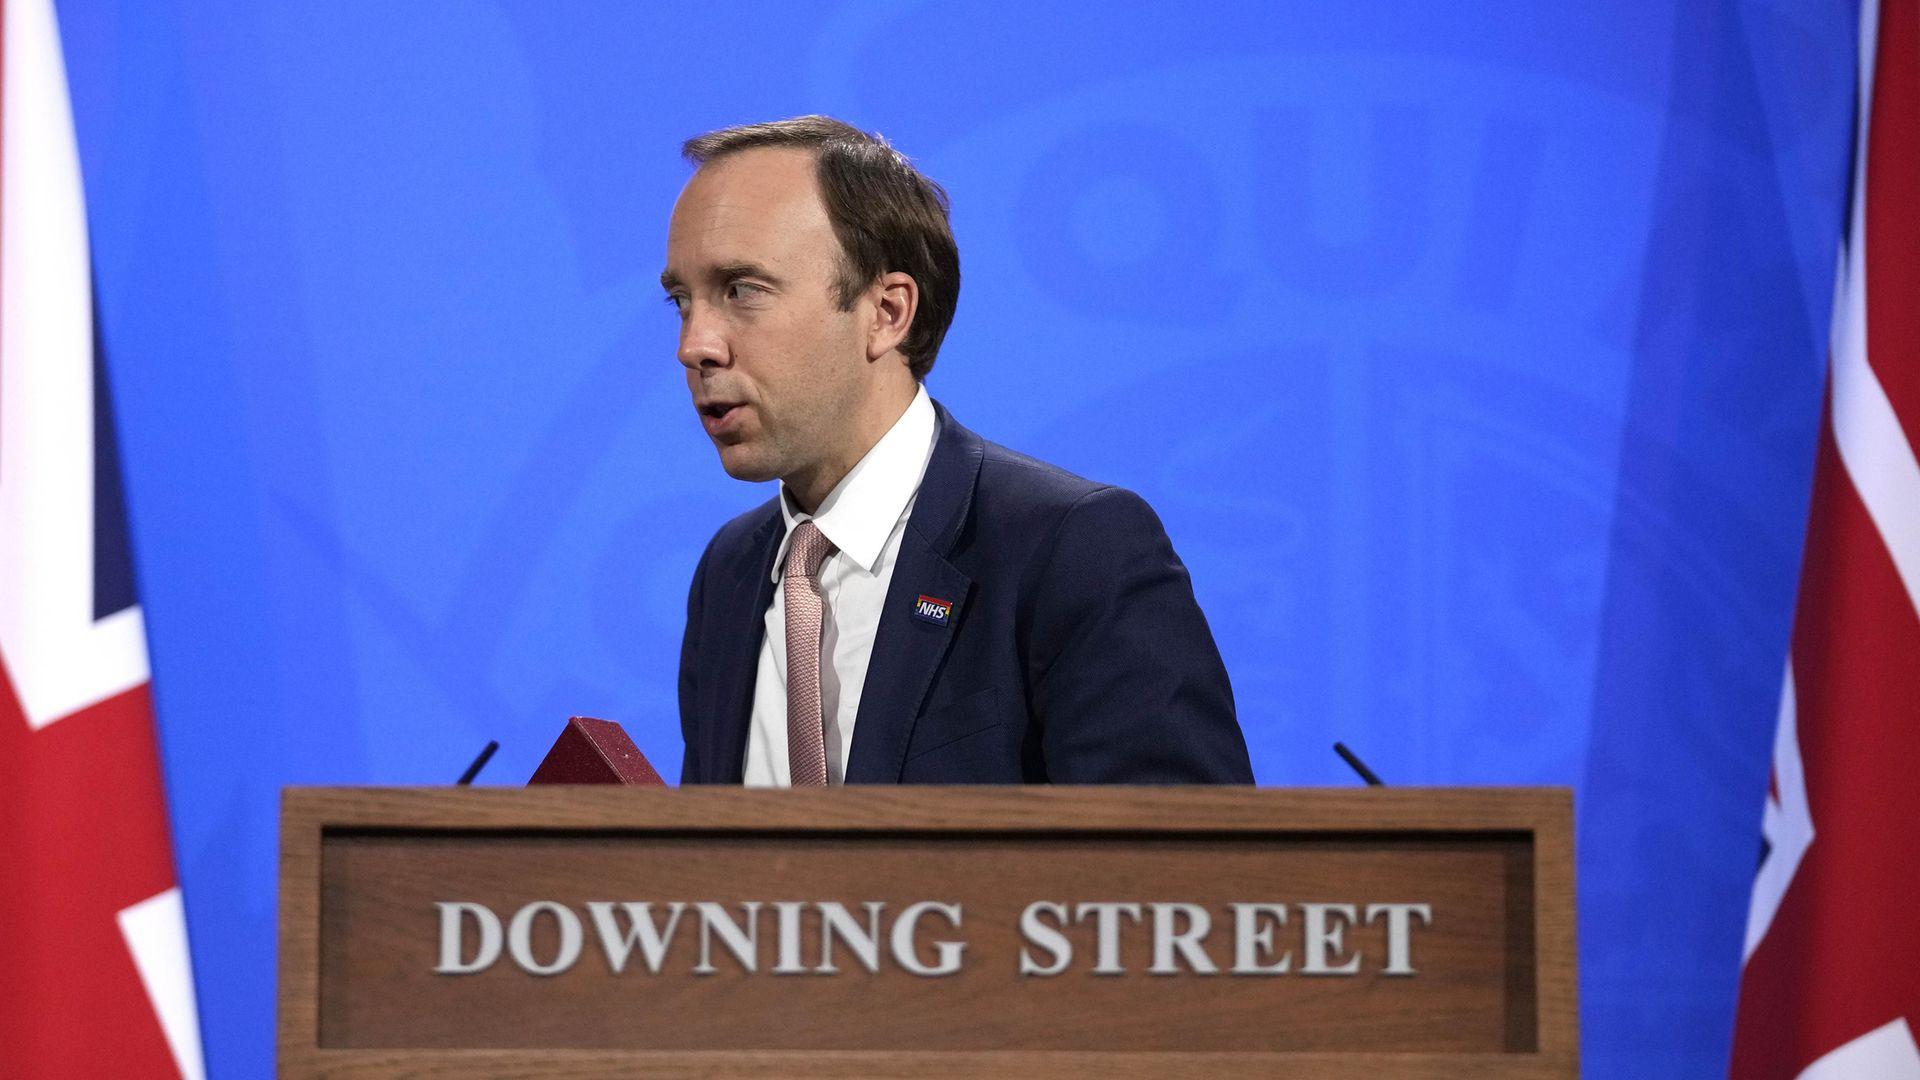 Health Secretary Matt Hancock leaves following a media briefing in Downing Street - Credit: PA